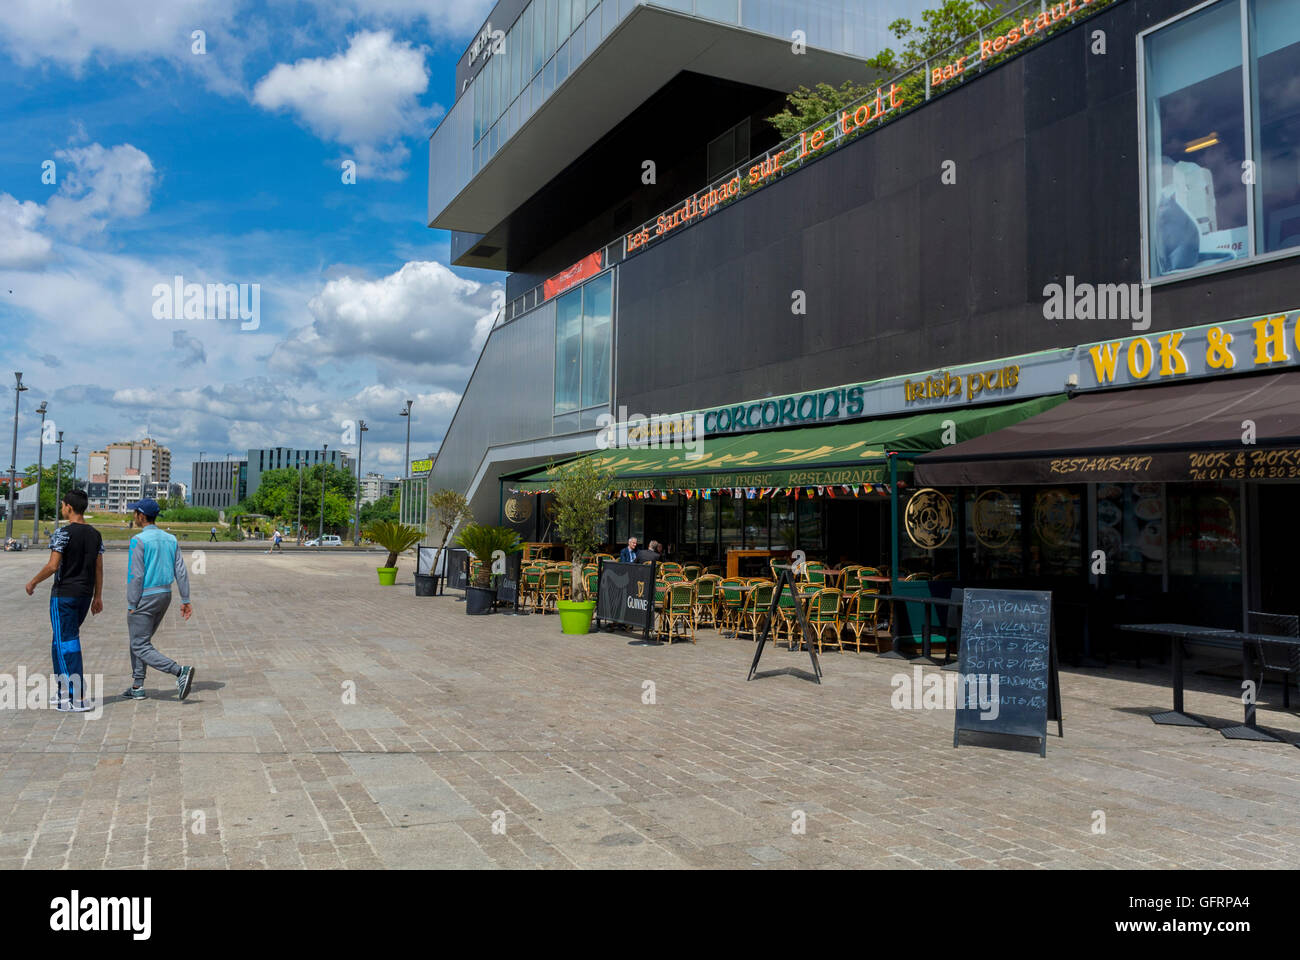 Parigi, Francia, dintorni, Scene di strada, architettura moderna, Ristorante francese, Porte des Lilas, Seine Saint Denis, quartiere suburbano Foto Stock